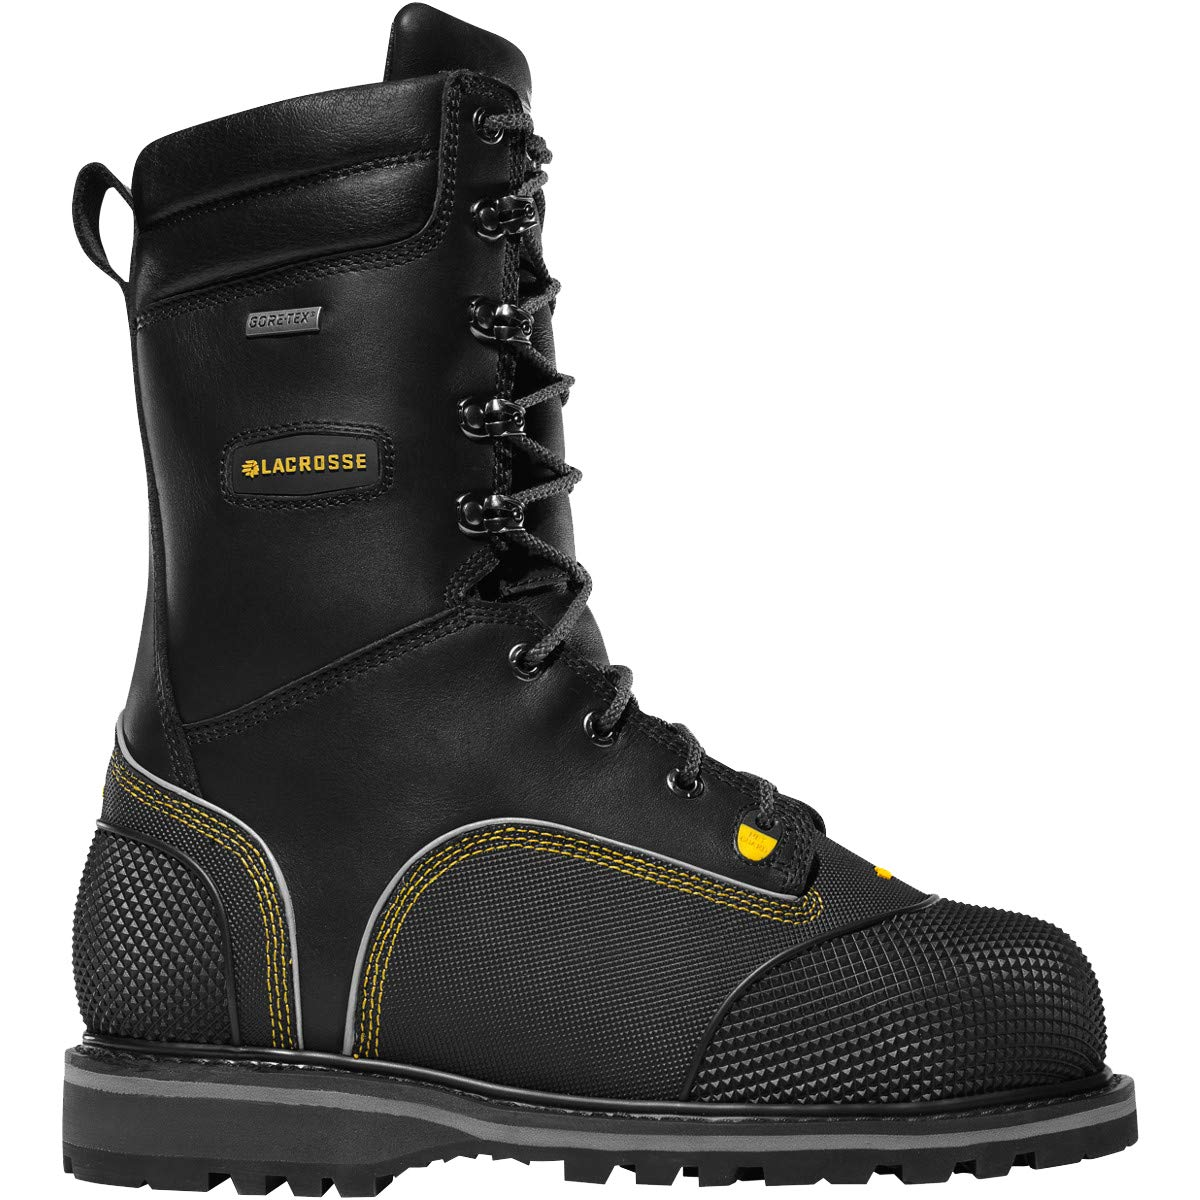 c2fd481ac25 Amazon.com | Lacrosse Men's Longwall II 200G MET/NMT-M | Industrial ...